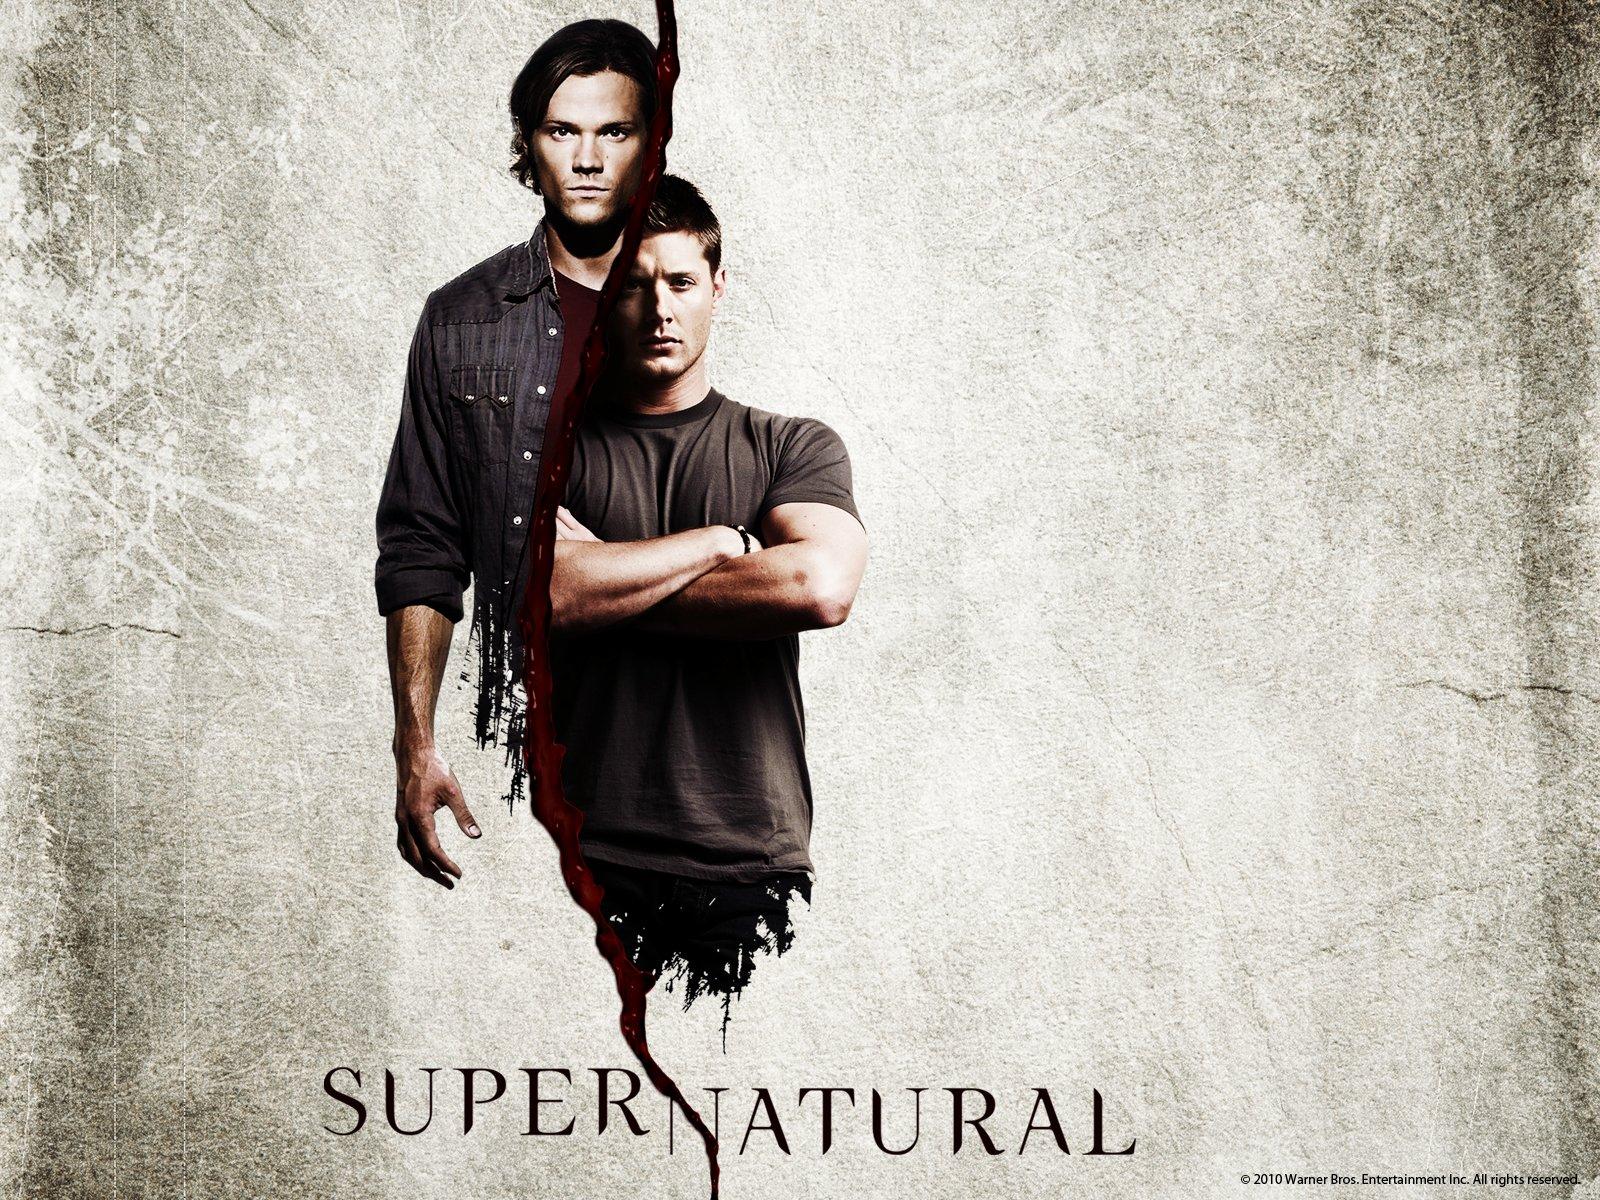 supernatural season 6 episode 21 download